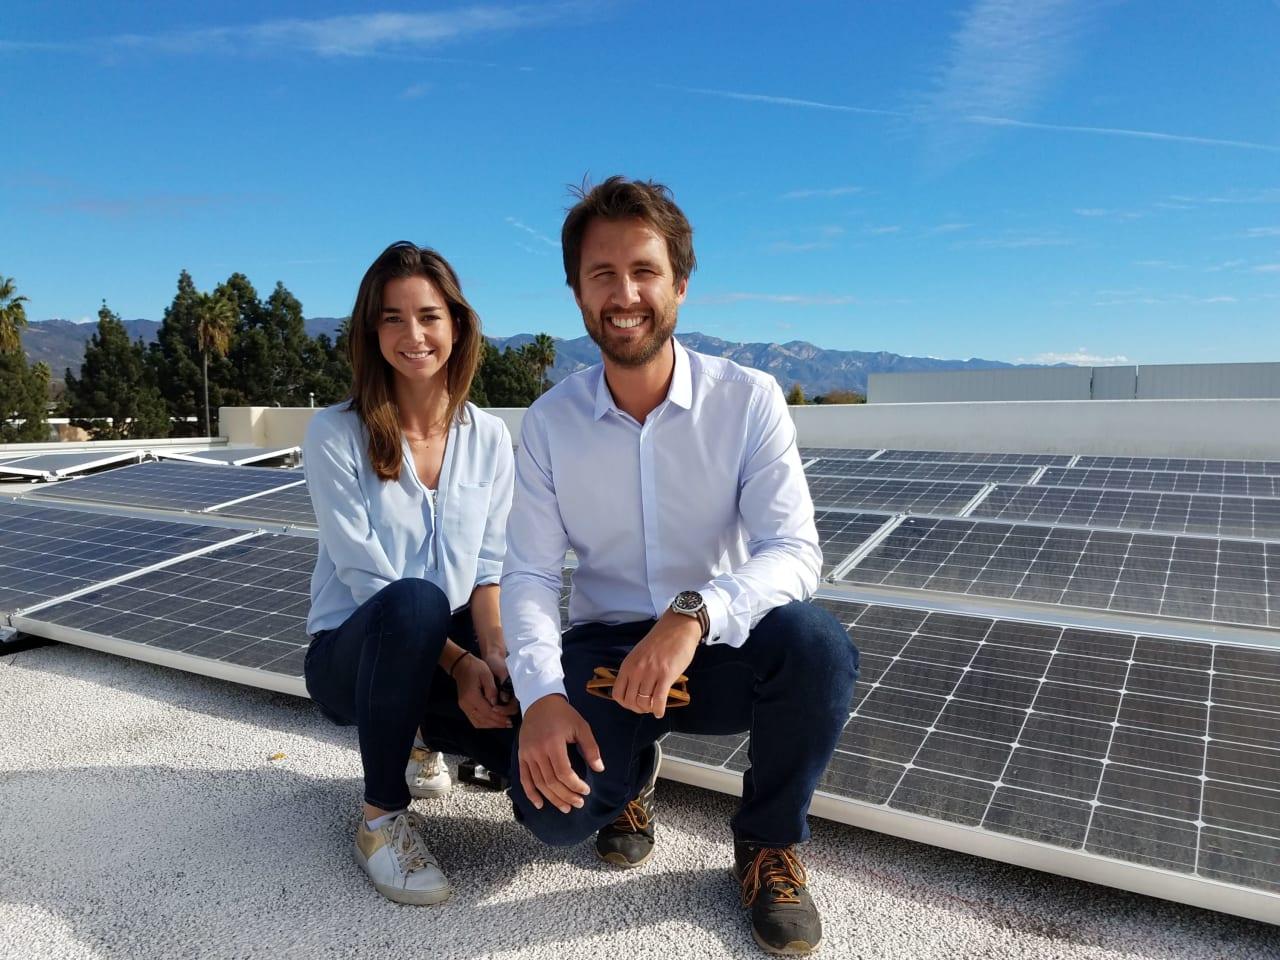 Faces of Our Community: Brighten Solar